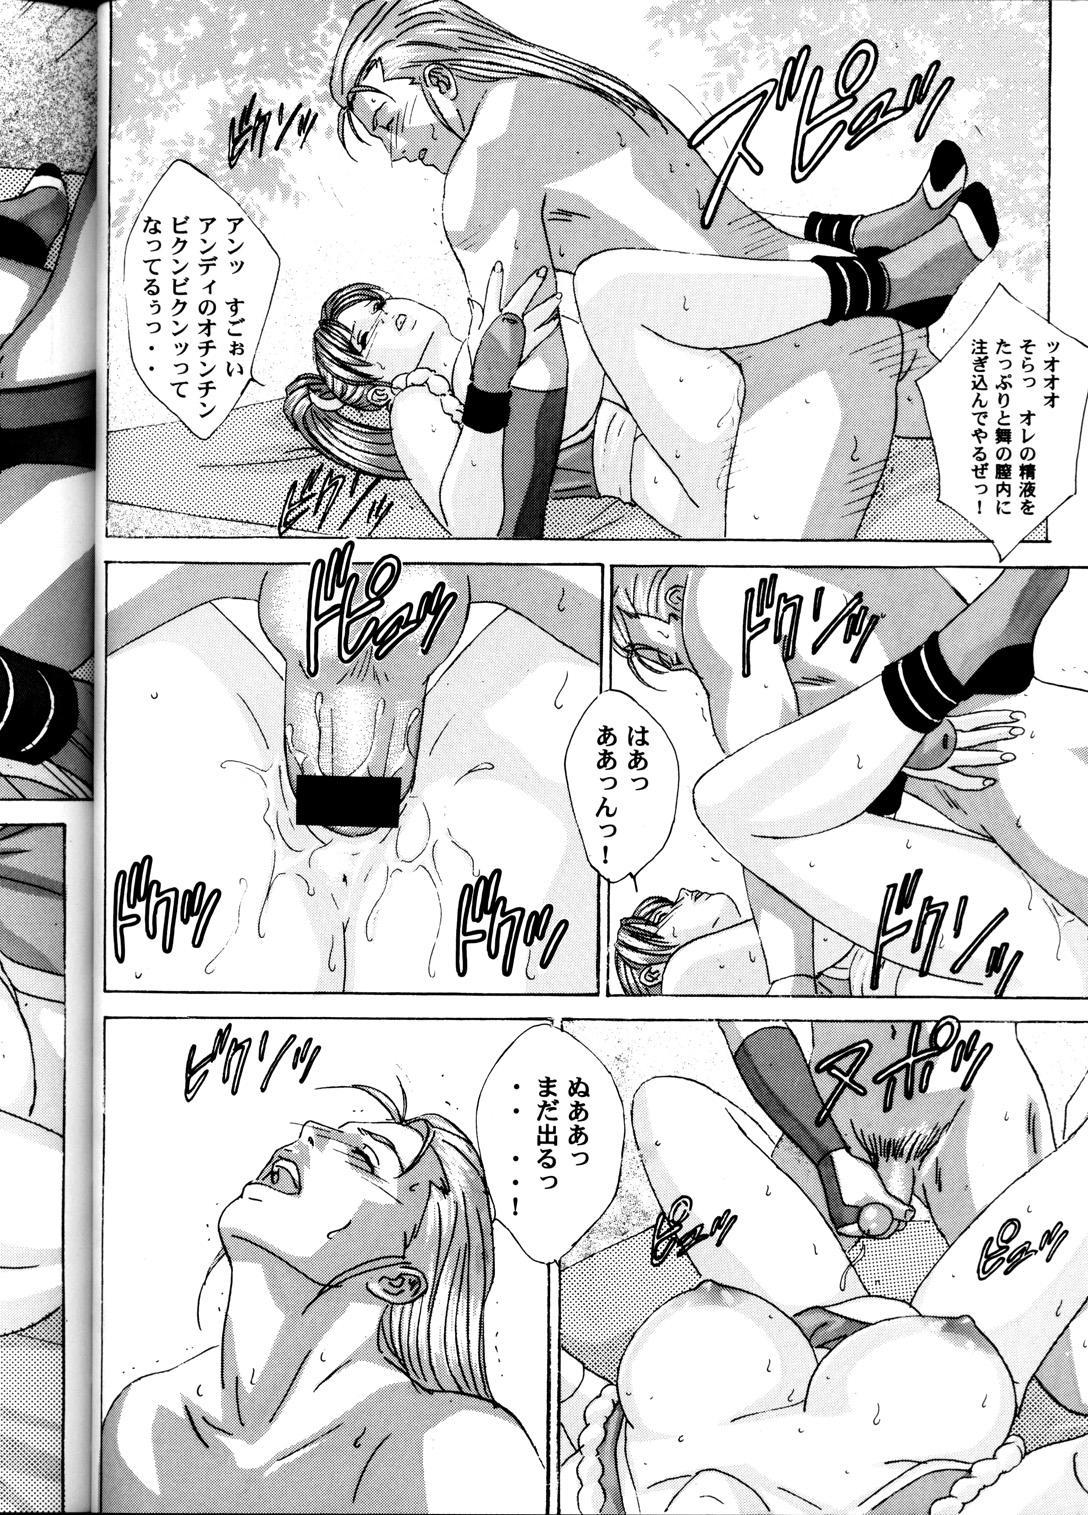 (C60) [D-LOVERS (Nishimaki Tohru)] Mai -Innyuuden- Daiichigou (King of Fighters) 38